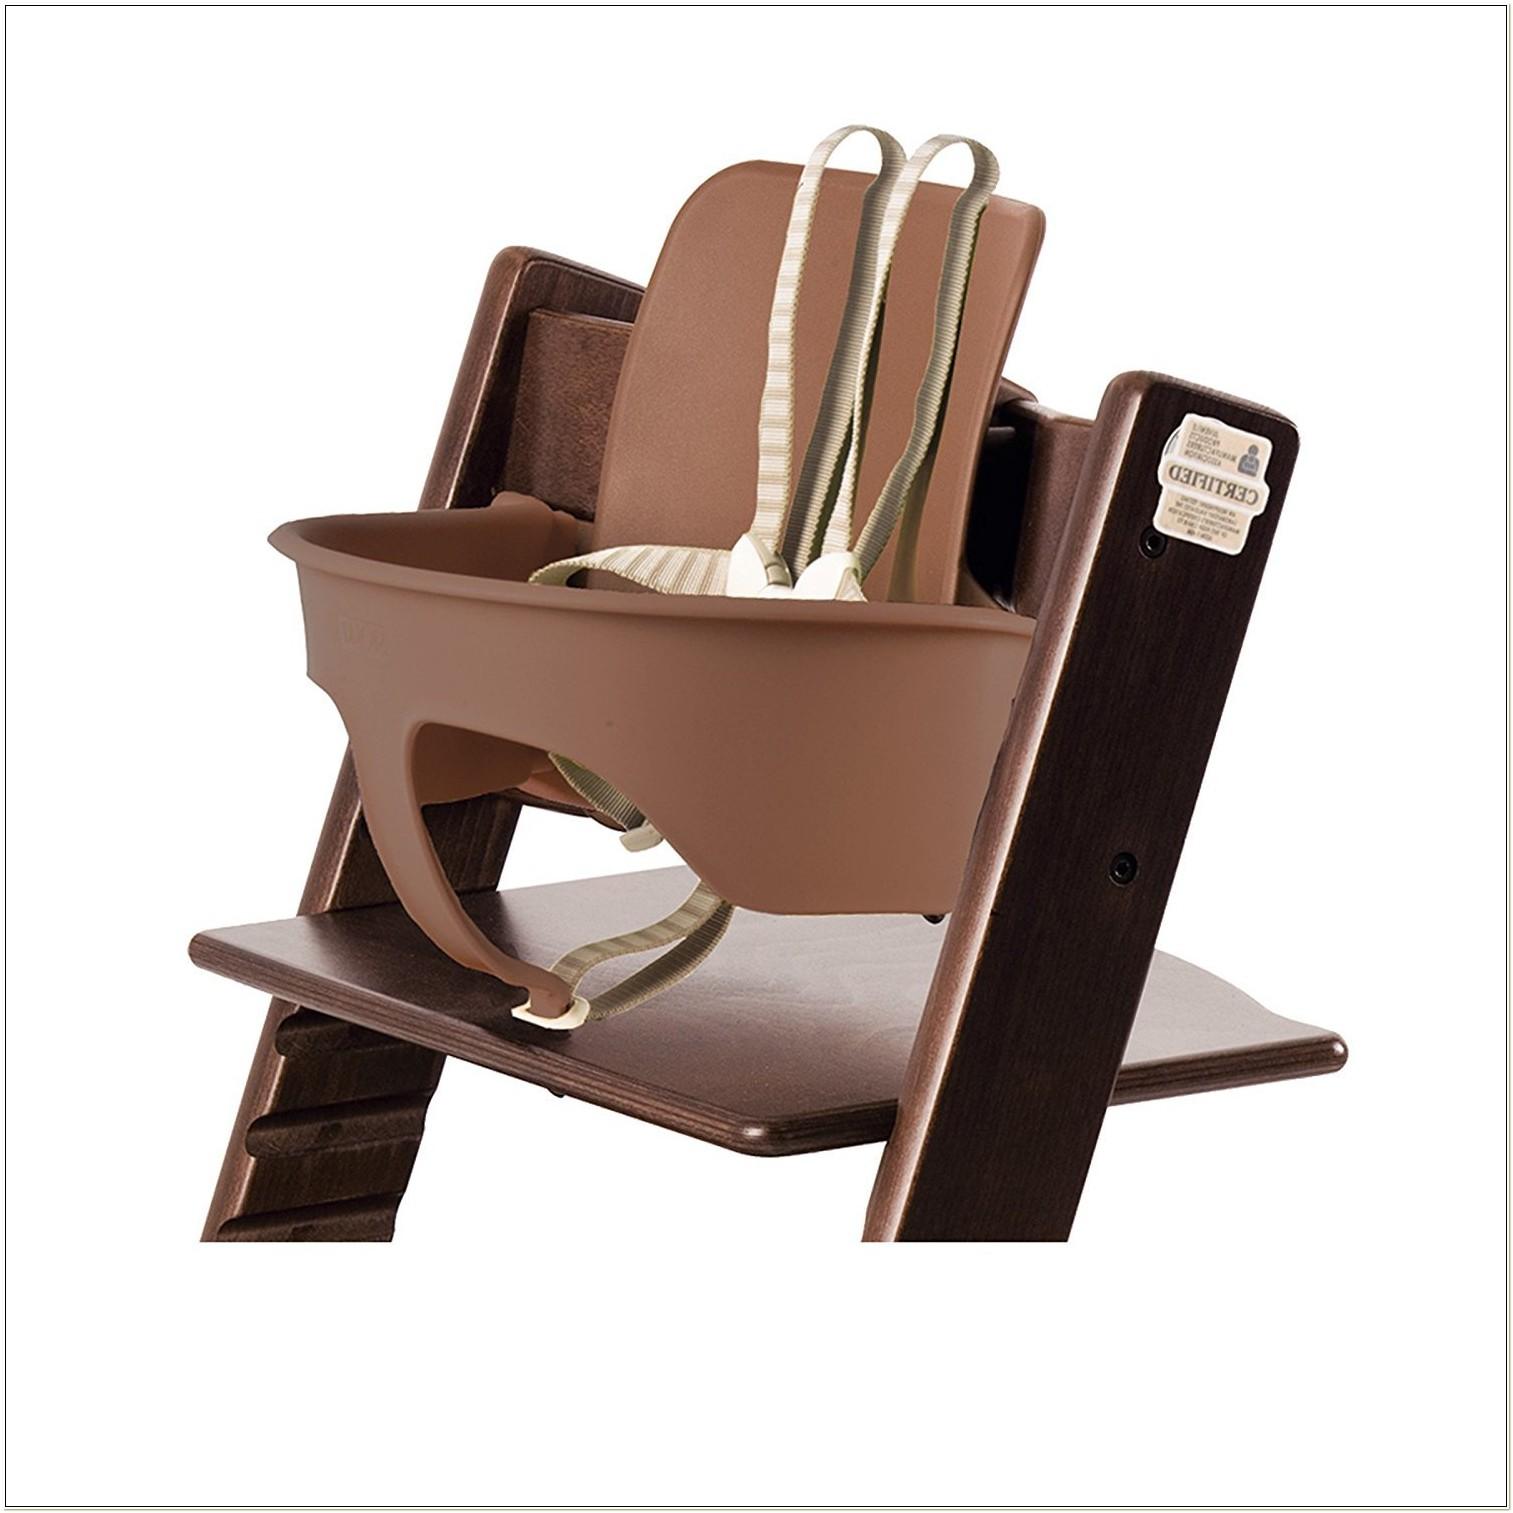 Stokke High Chair Cushion Amazon